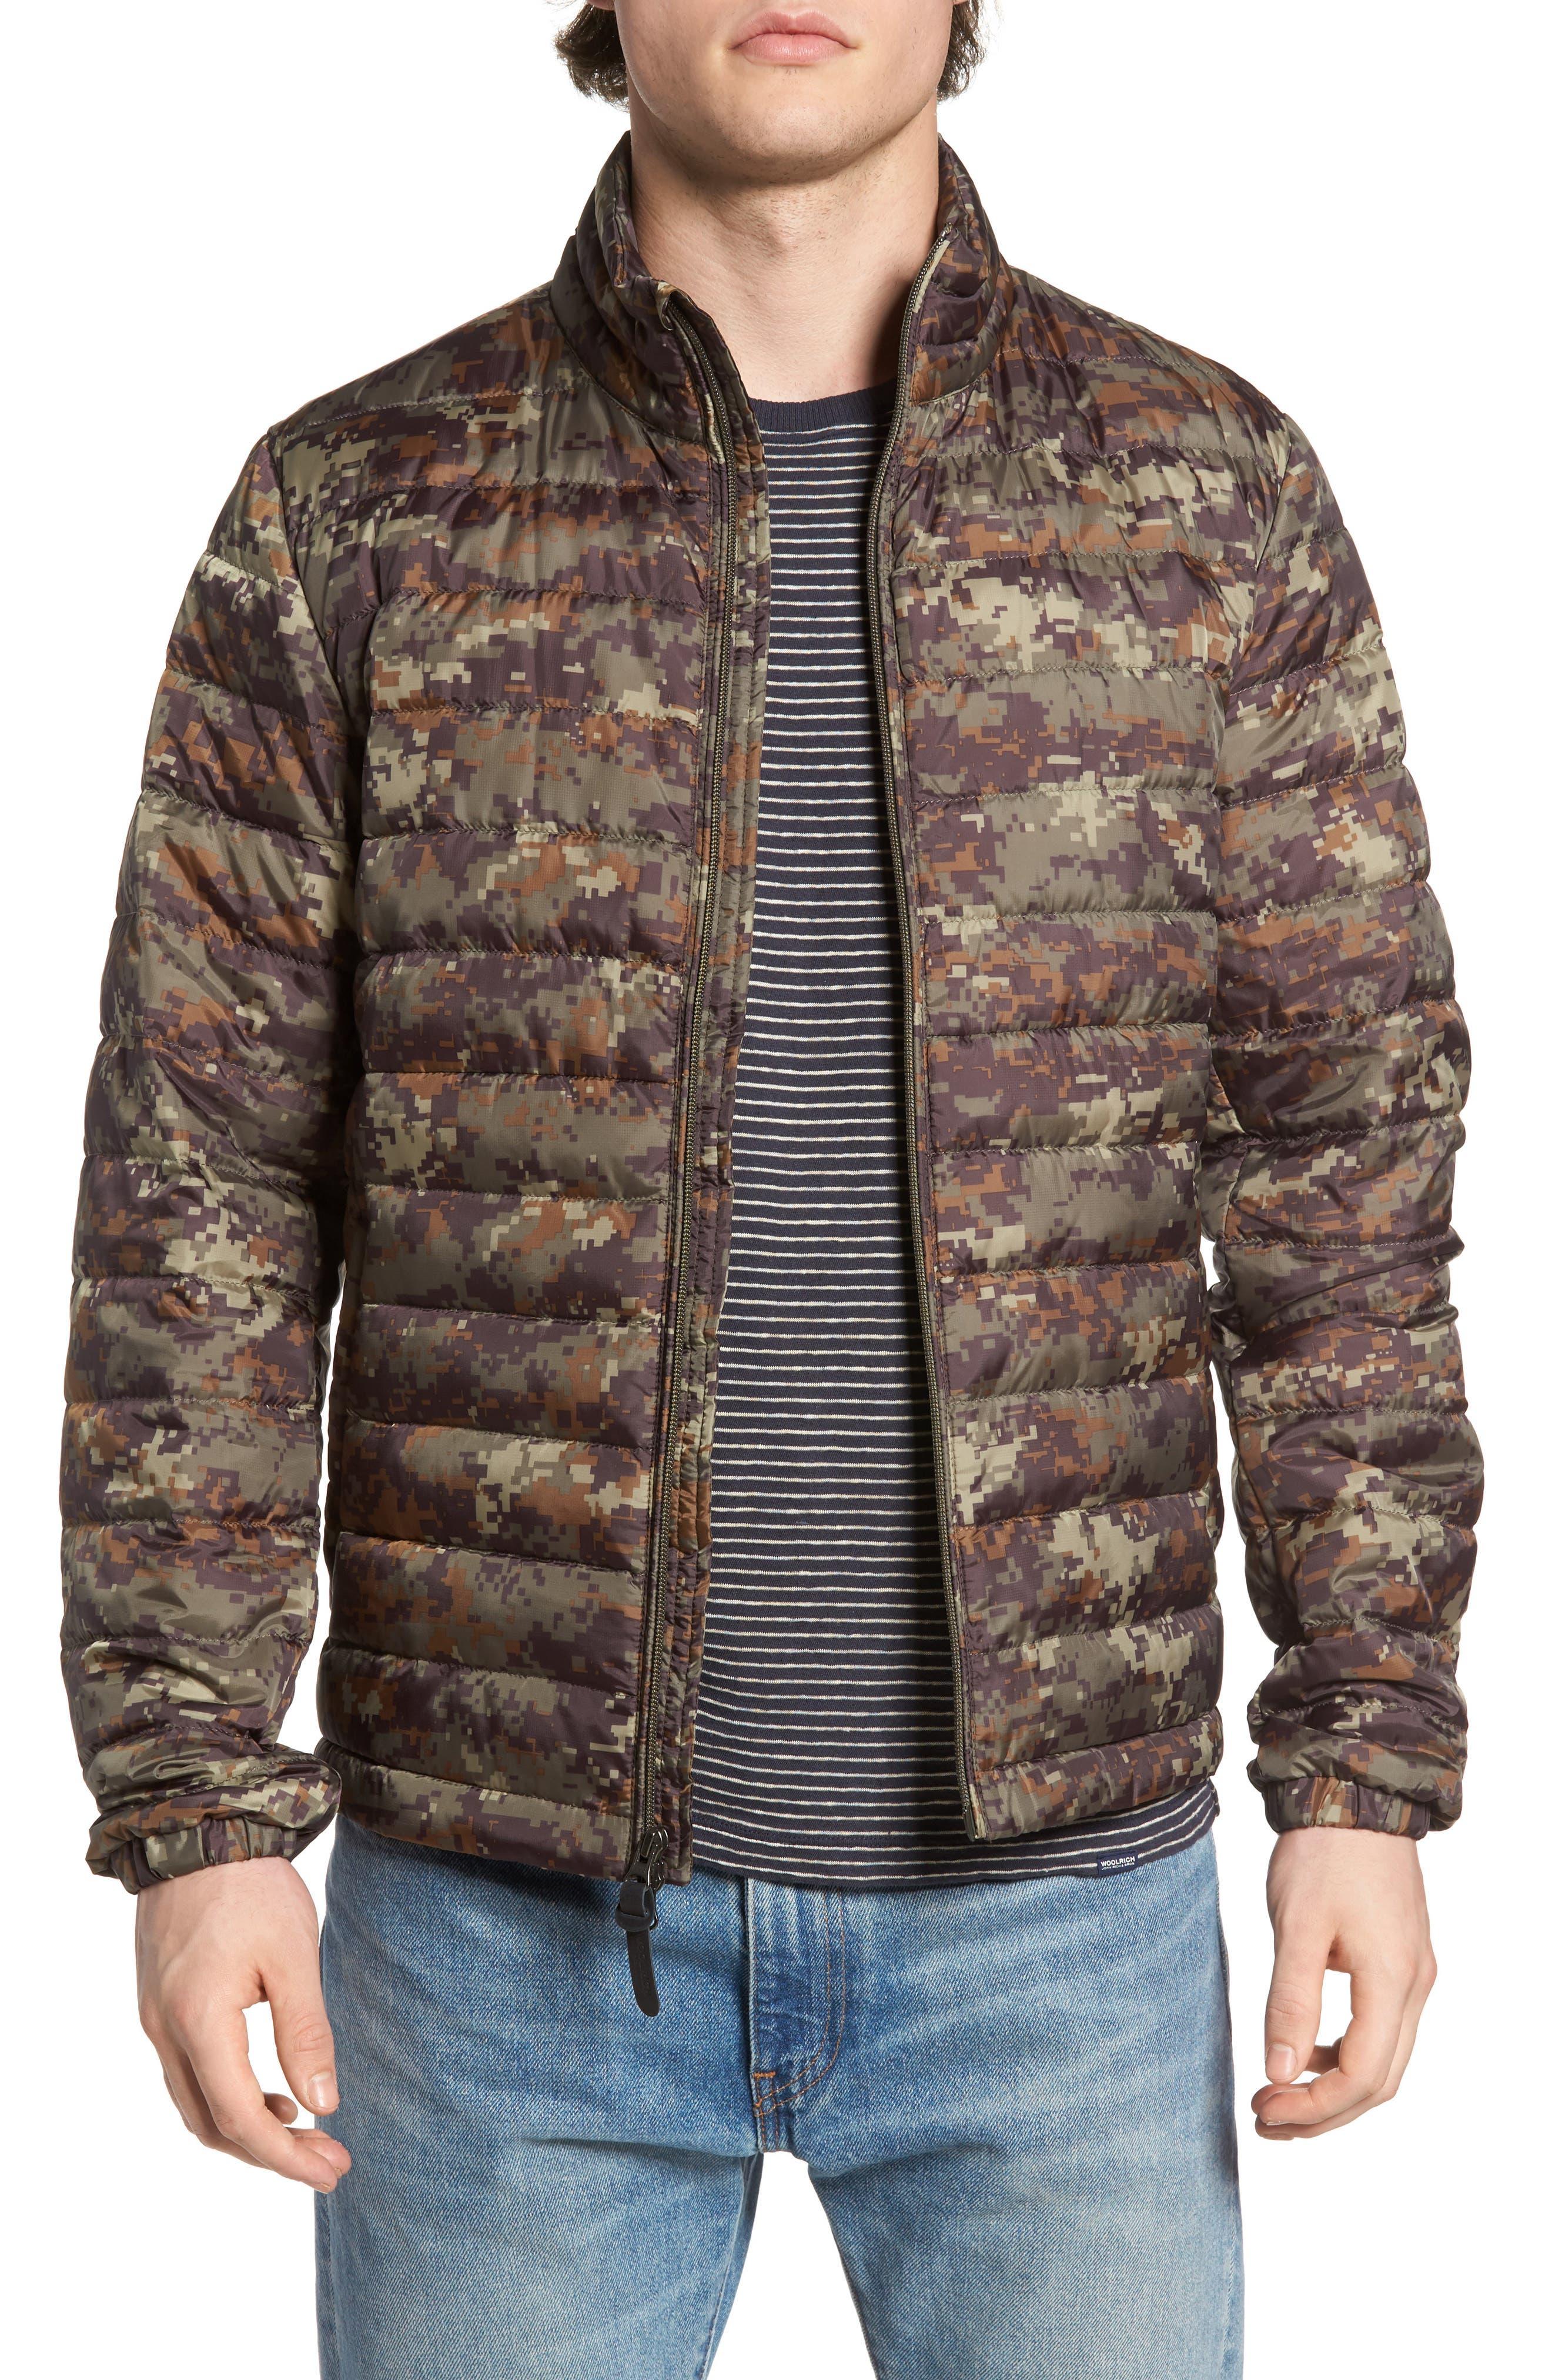 Main Image - Woolrich John Rich & Bros Camou Sundance Down Jacket